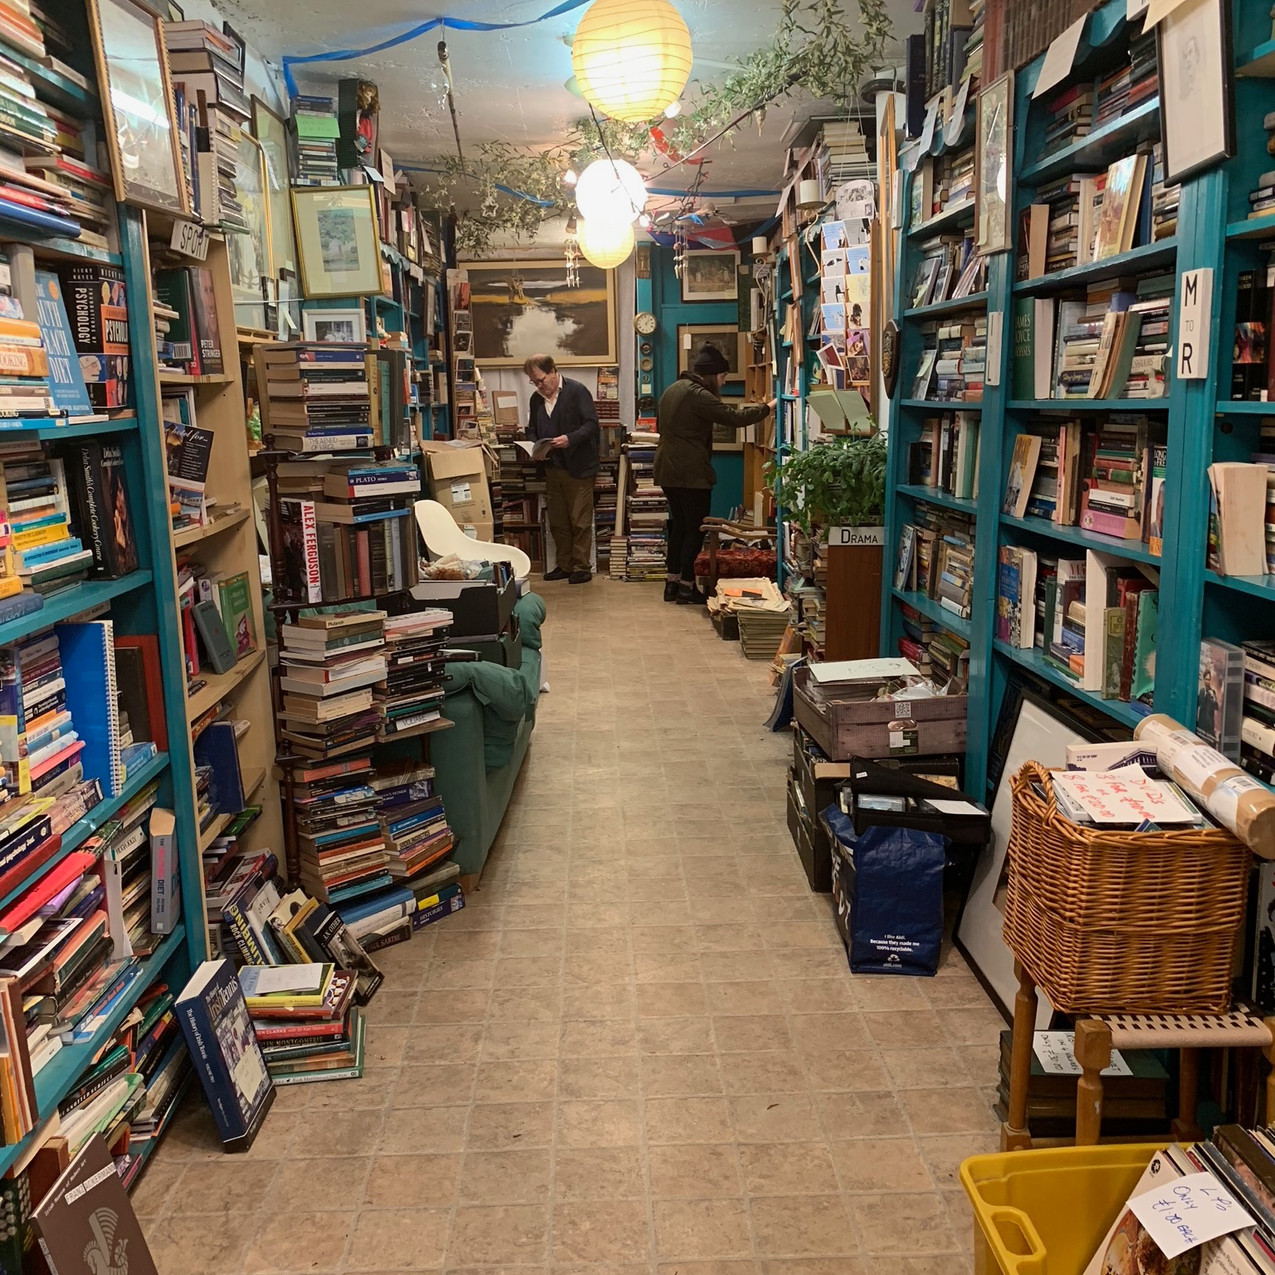 Looking for literary treasures in John's Bookshop.